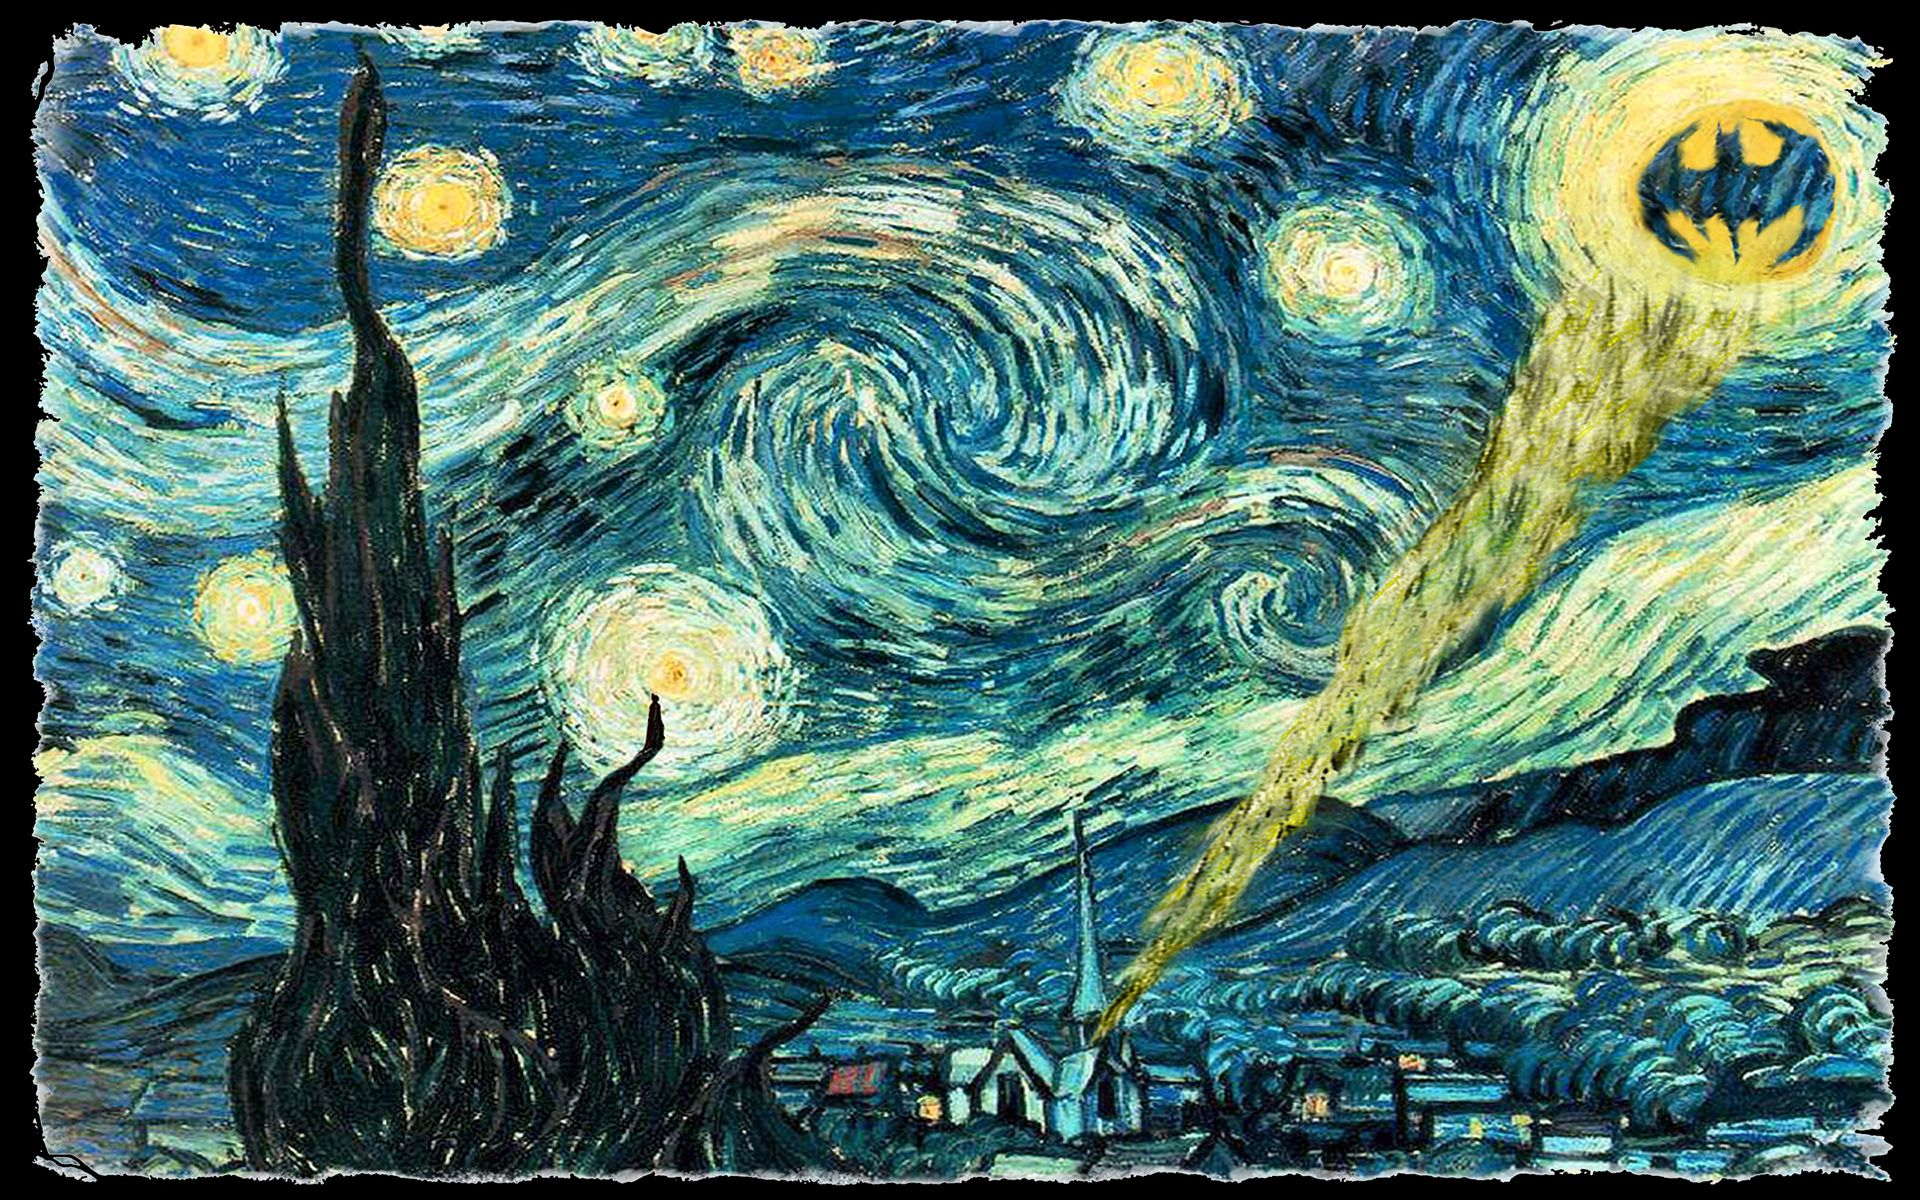 Vincent Van Gogh - La noche estrellada